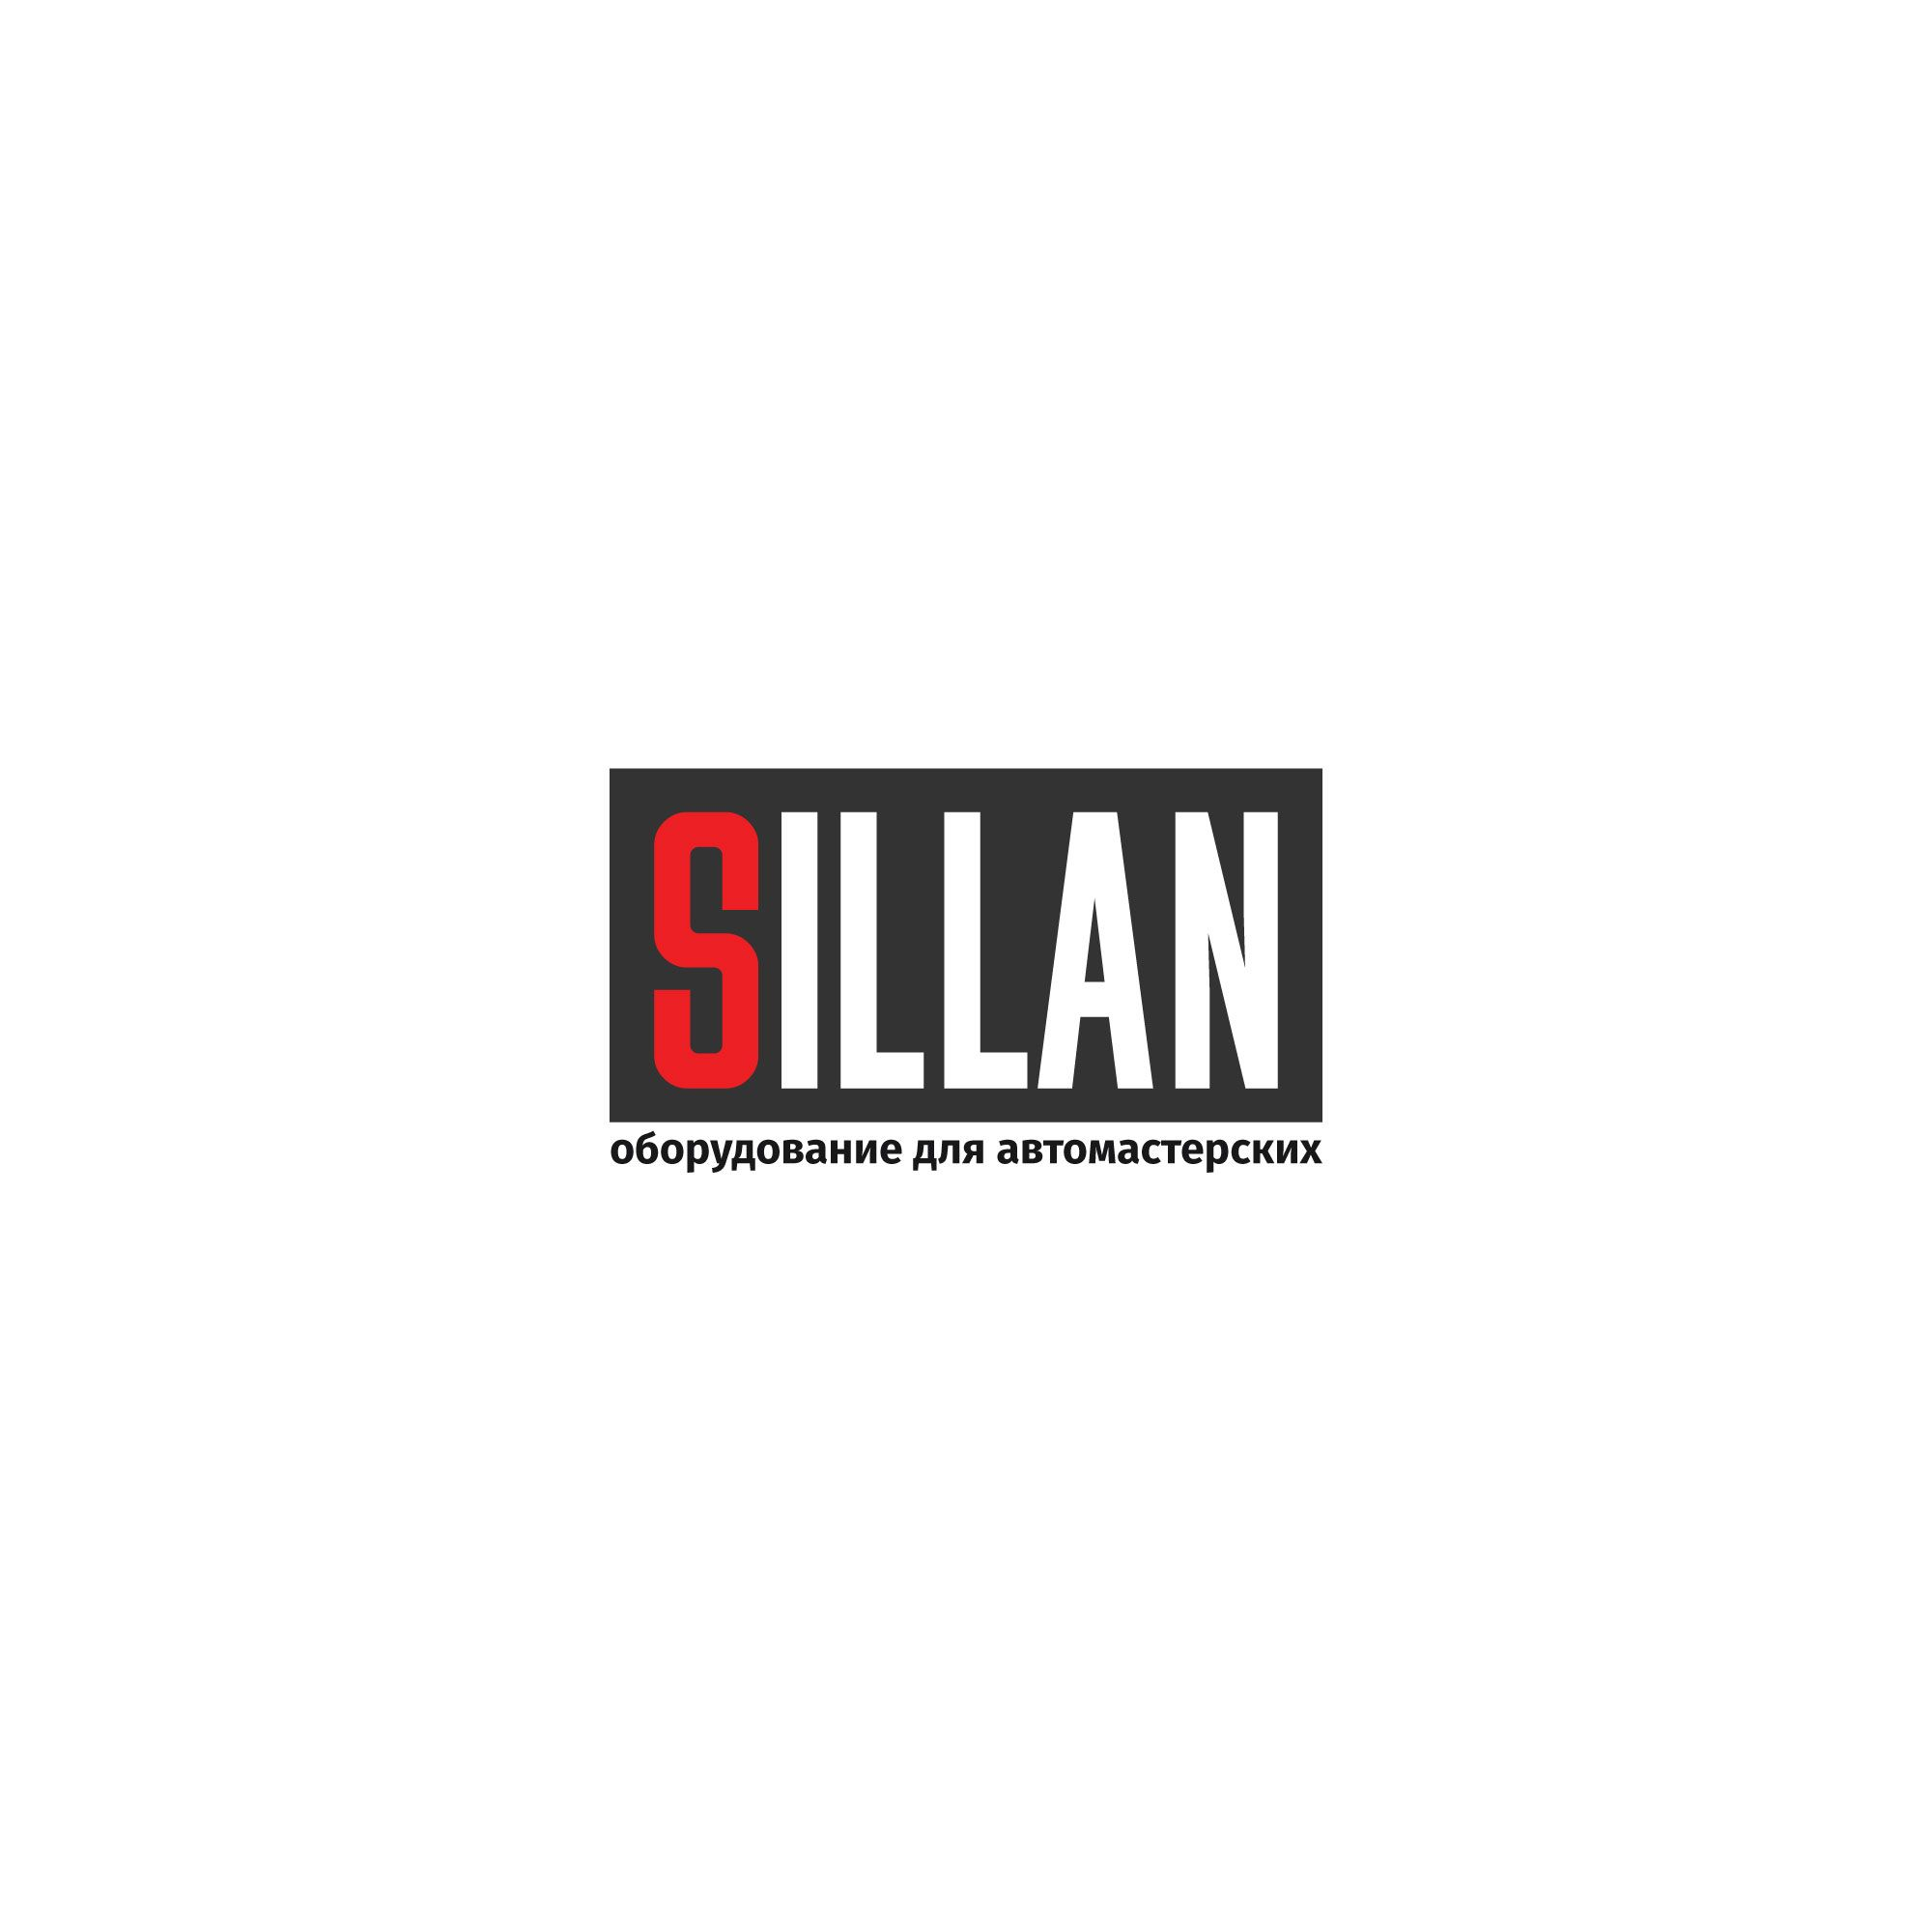 Логотип для Sillan - дизайнер oparin1fedor